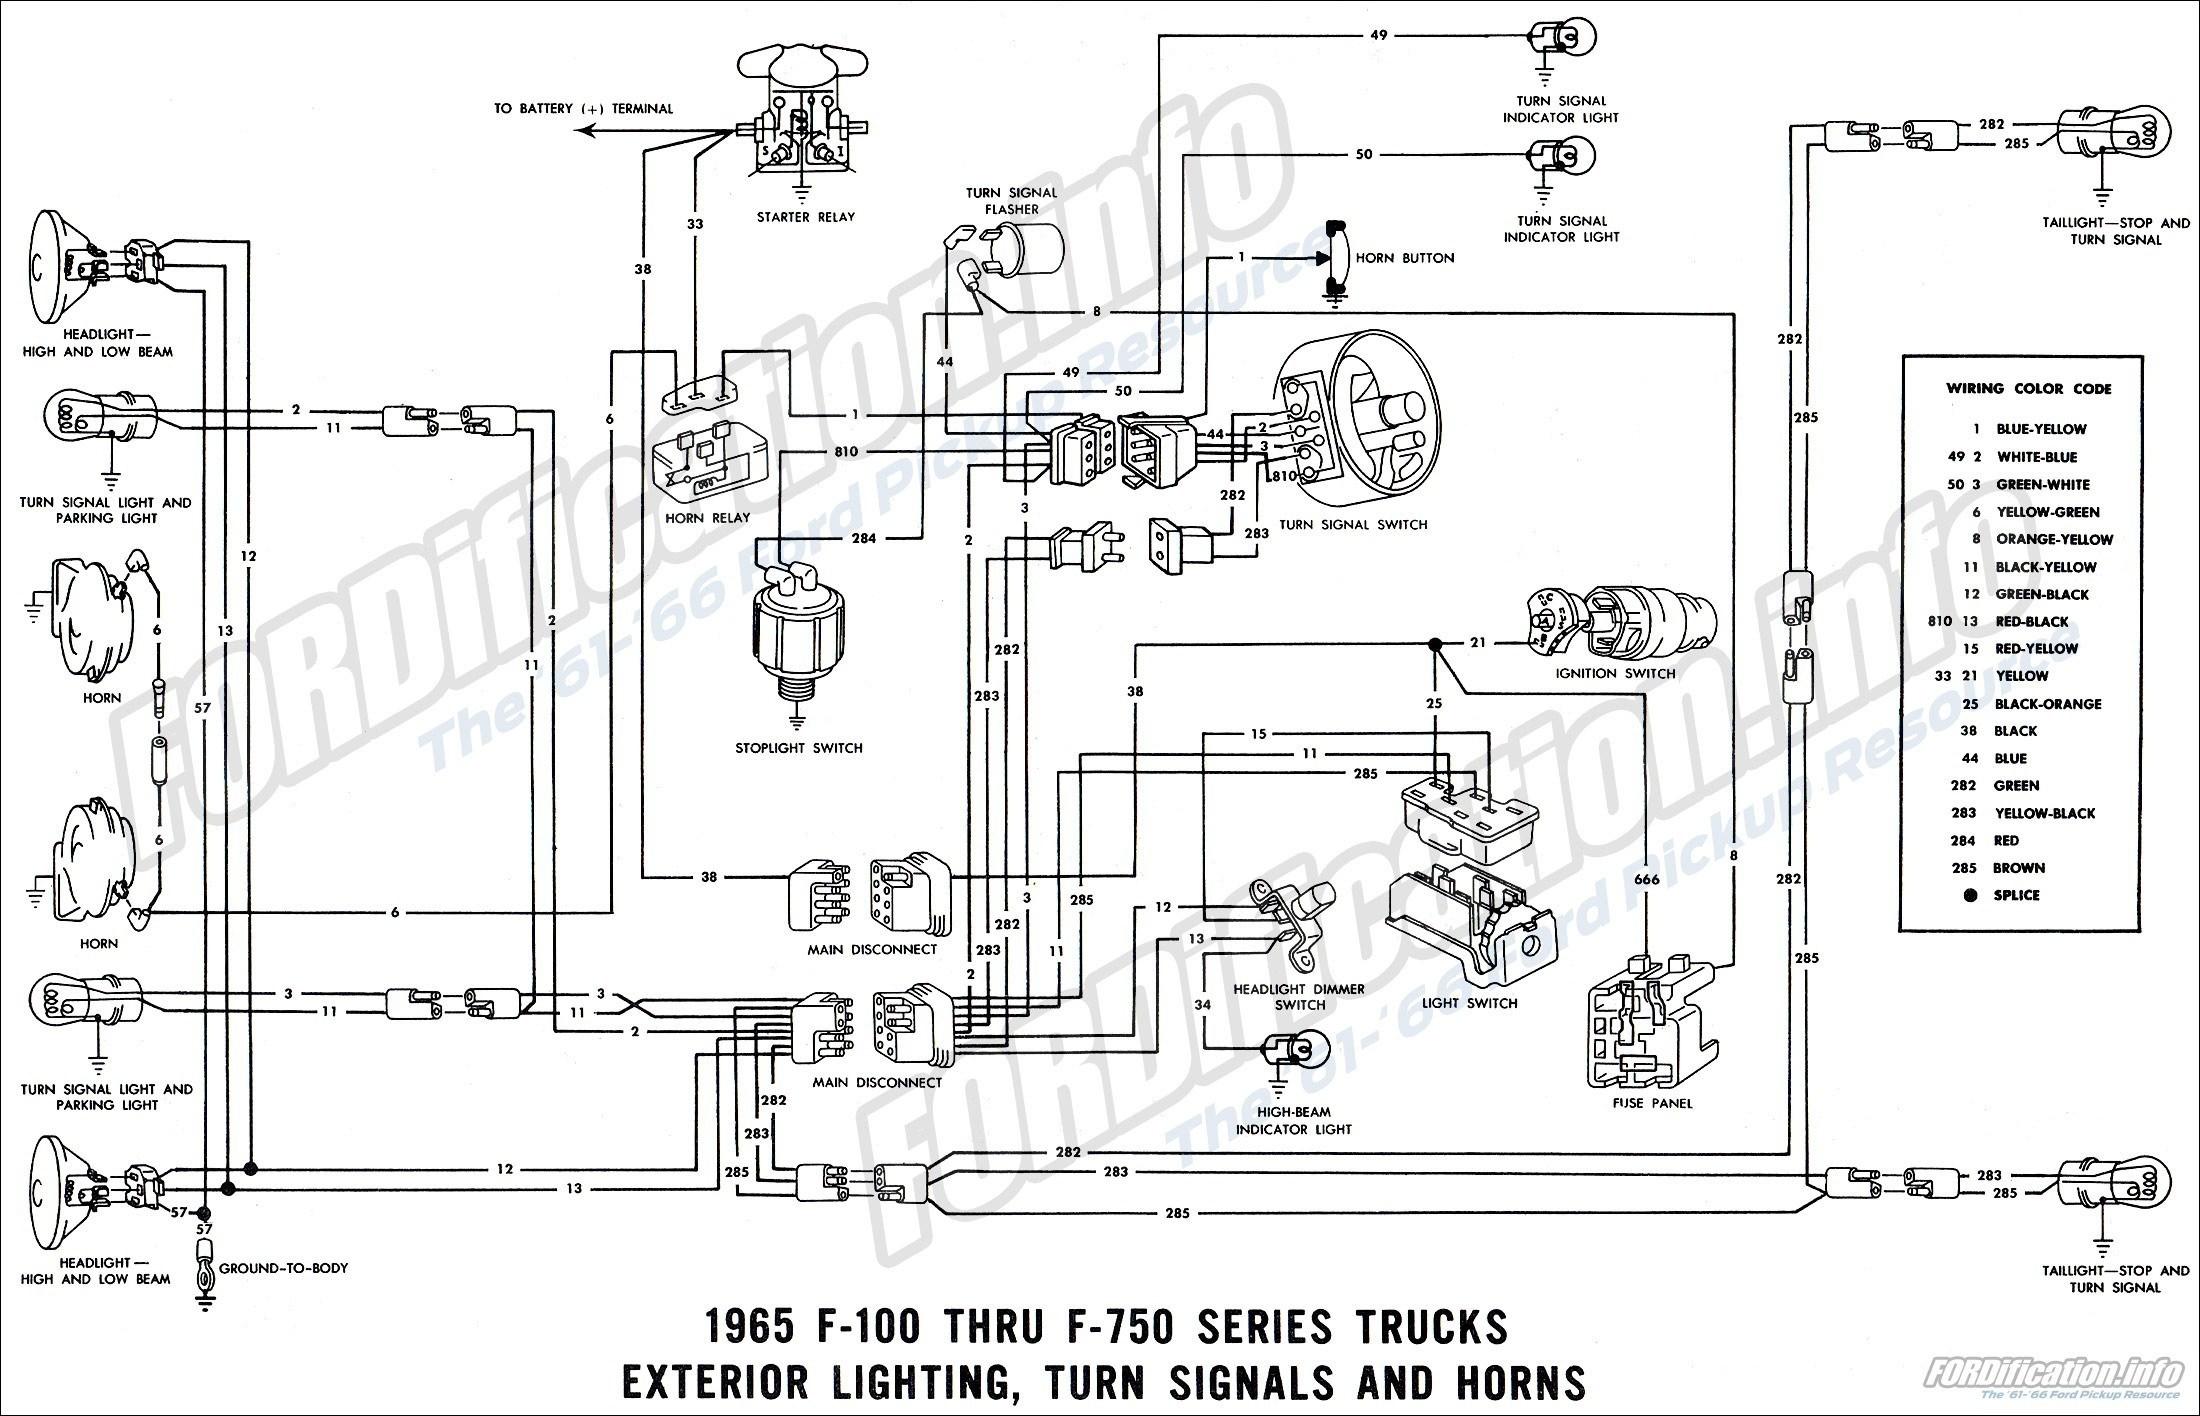 1951 ford truck wiring diagram - best wiring diagrams wood-packet -  wood-packet.ekoegur.es  ekoegur.es